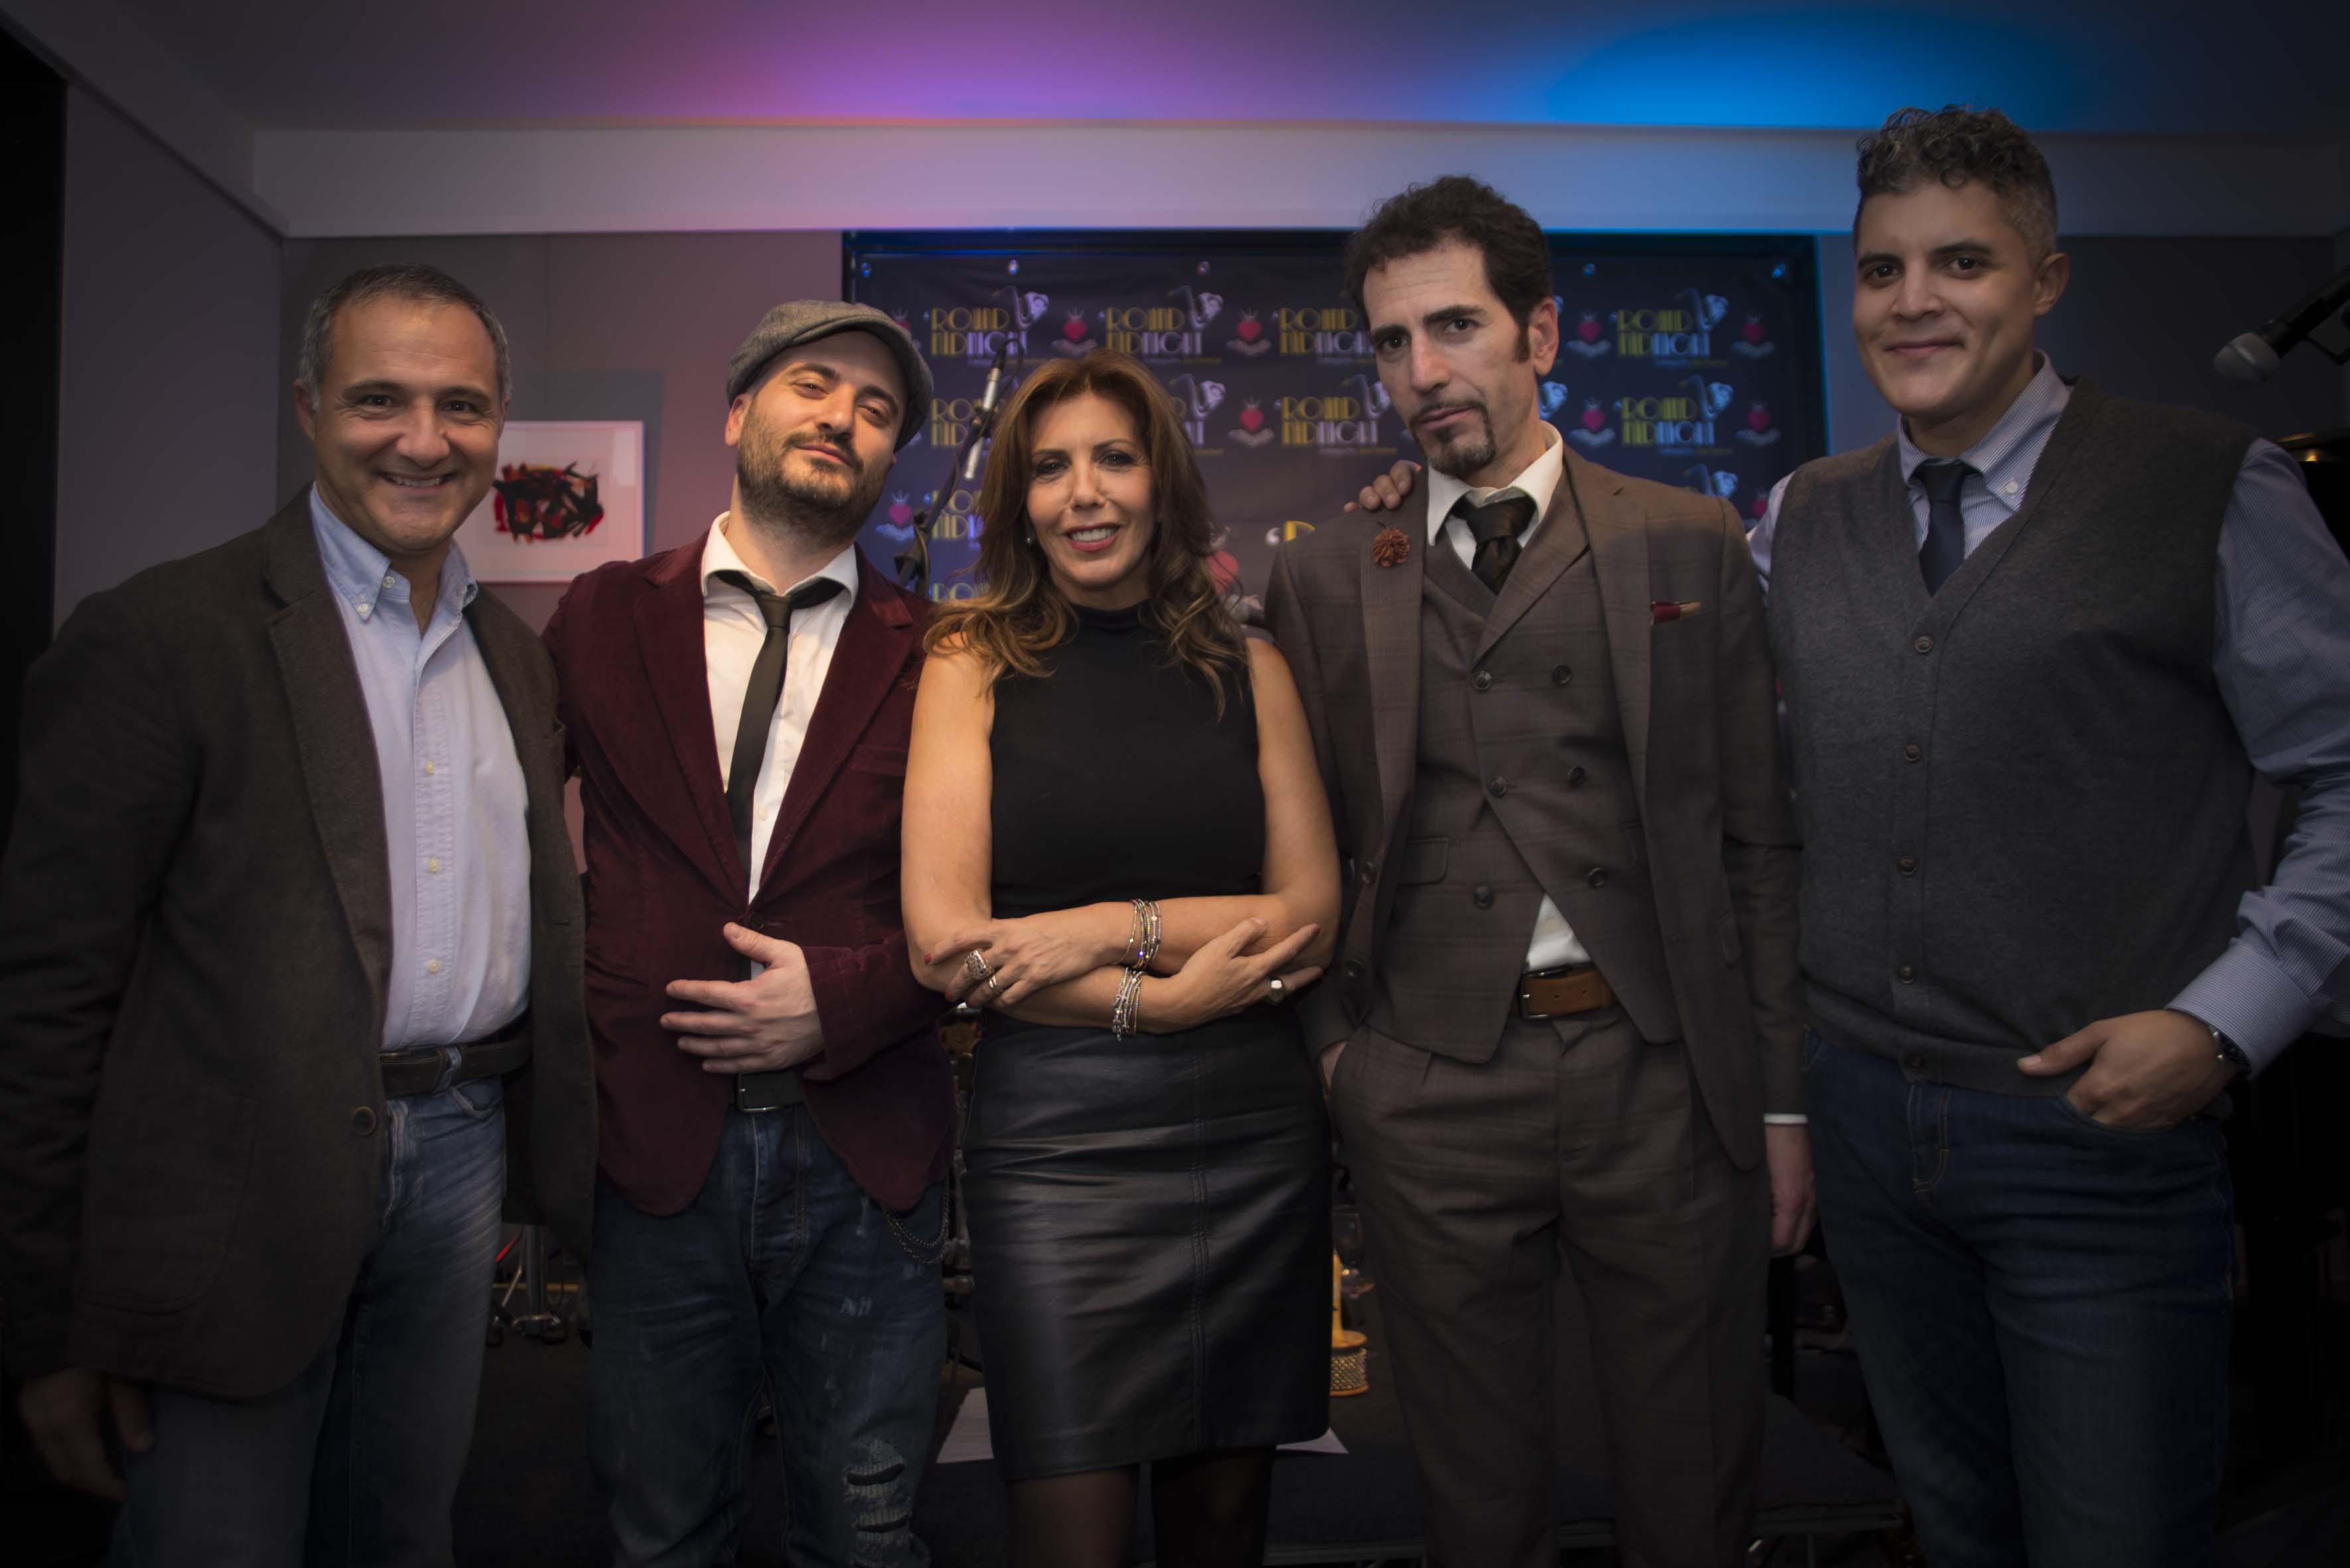 Max De Tomassi, Ginaski Wop, Tina Vannini, Alfonso Tramontana, Robertico Martinez